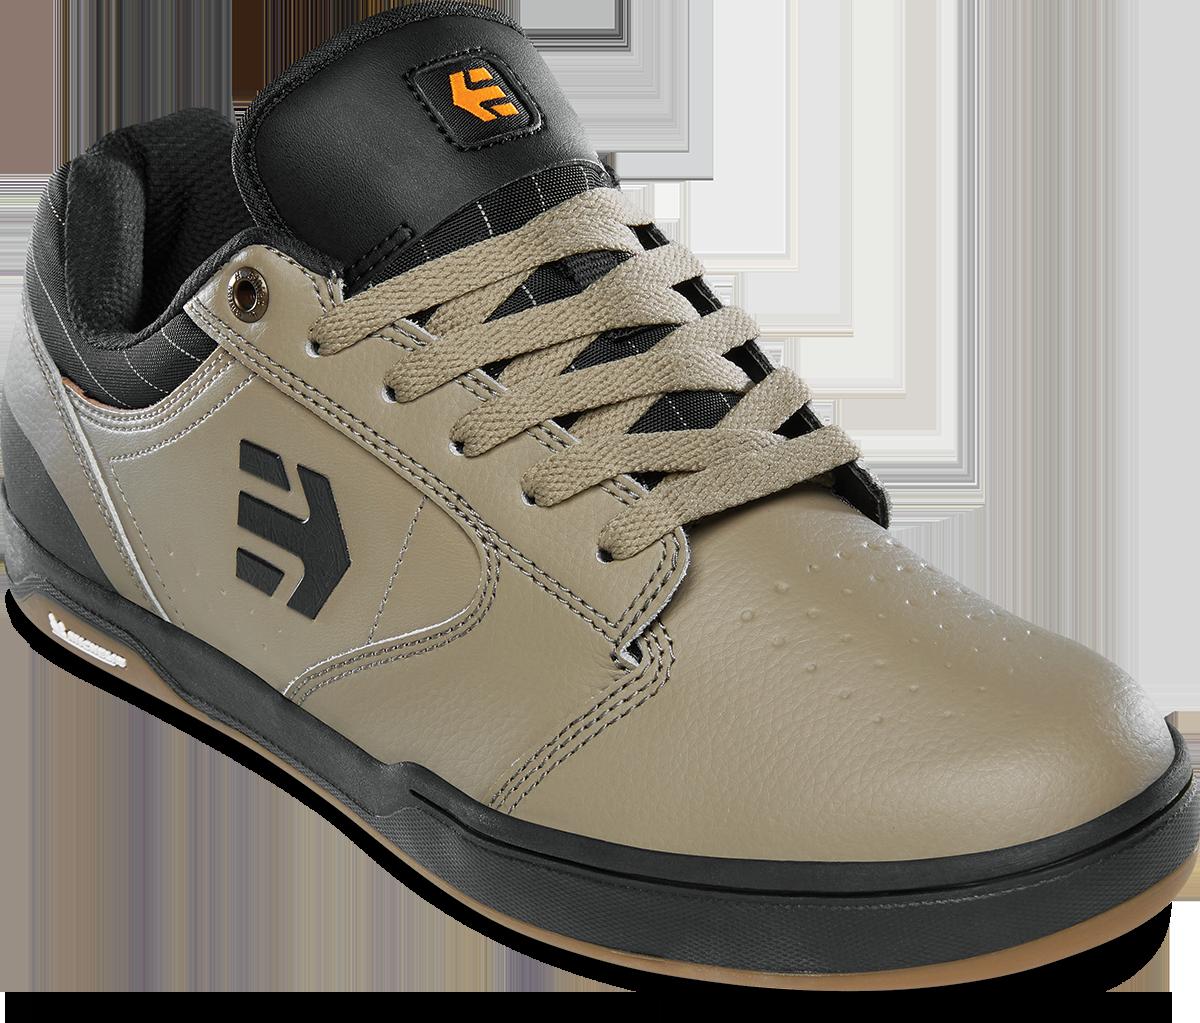 etnies camber mtb sneakers